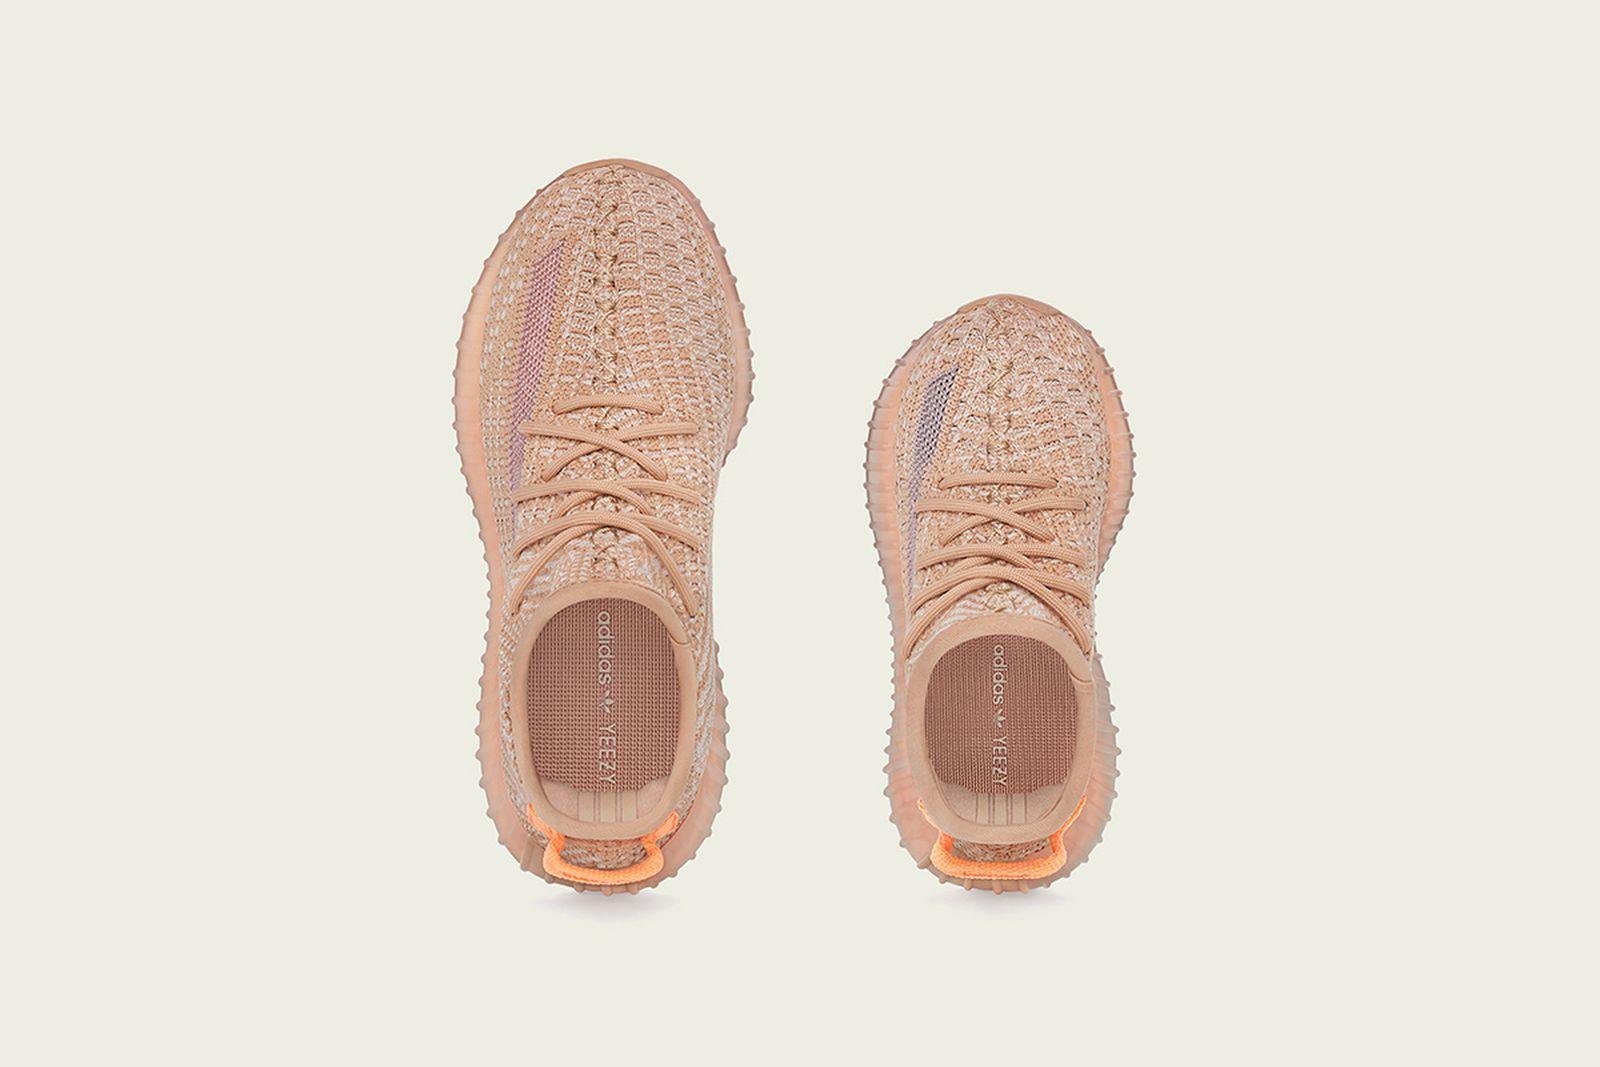 adidas originals yeezy boost 350 v2 clay release date price kids adidas Originals YEEZY 350 V2 kanye west